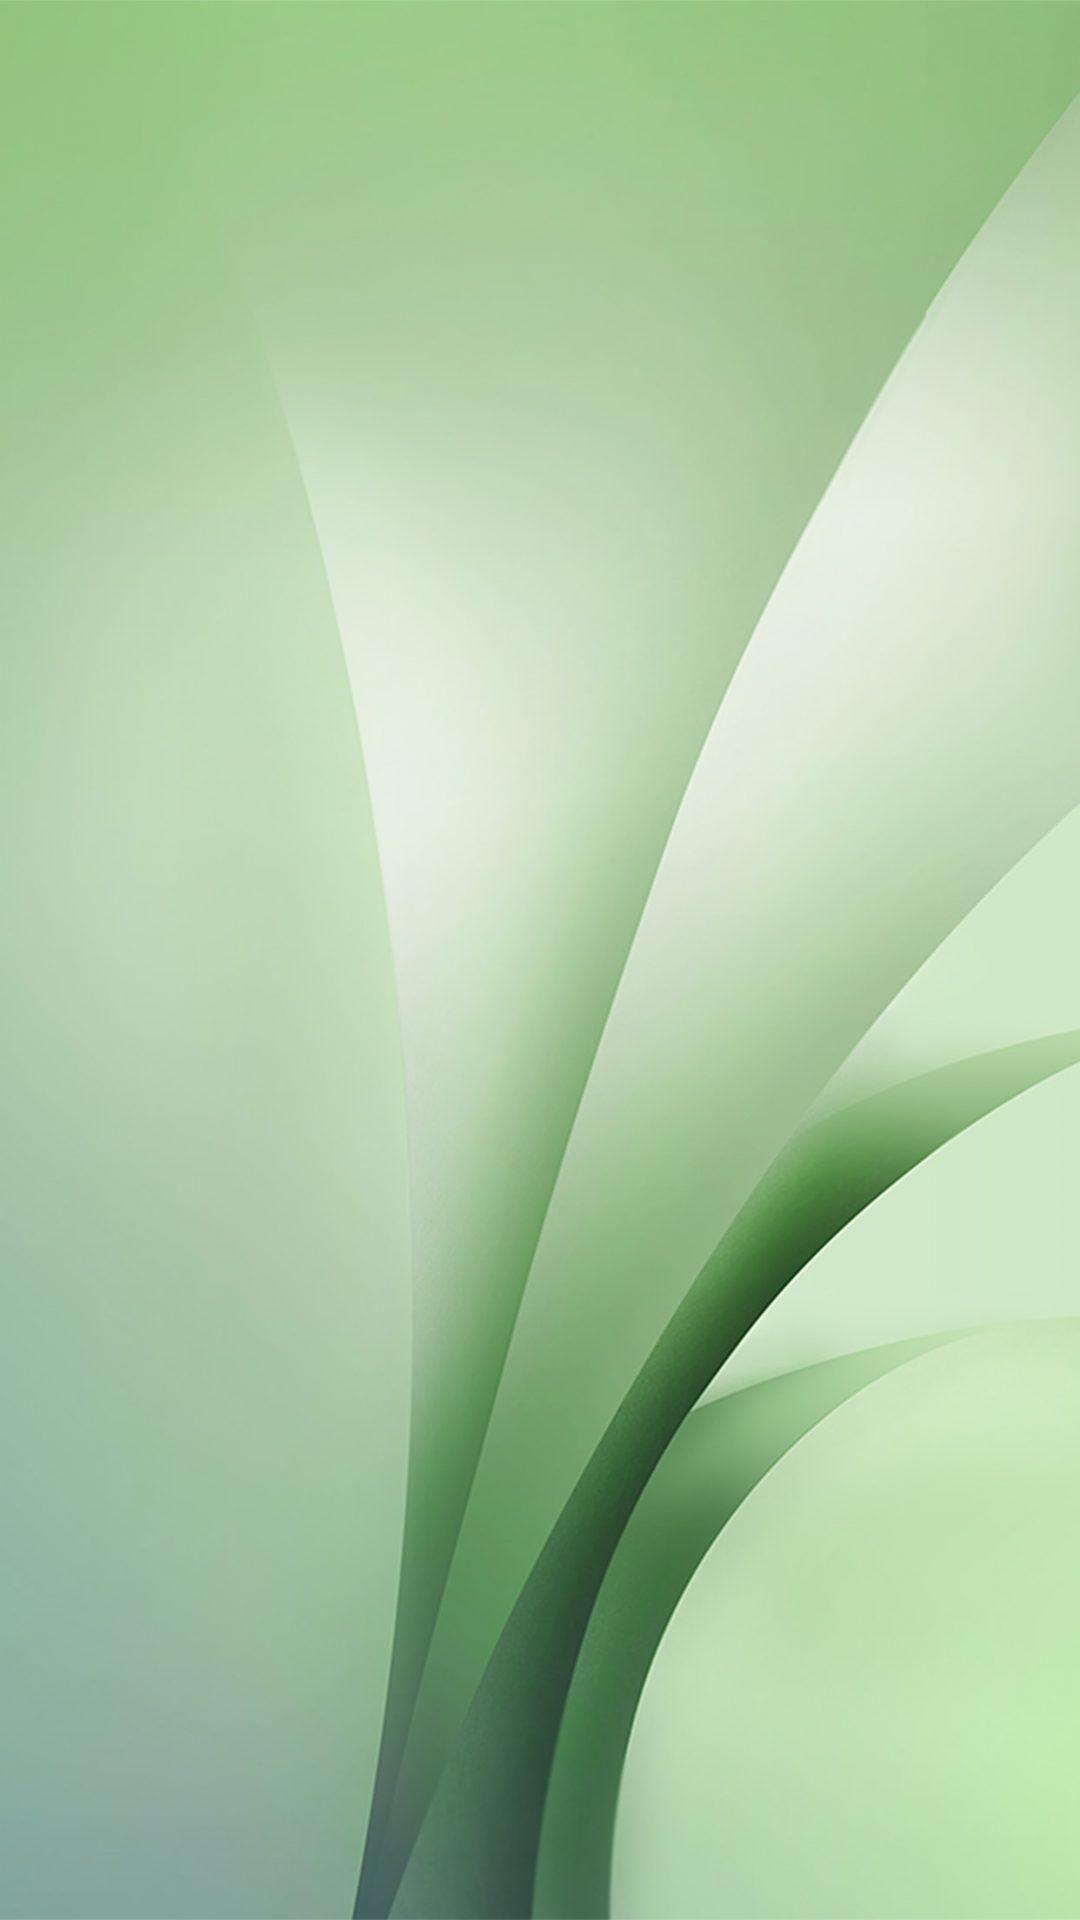 Samsung Galaxy Abstract Green Pattern